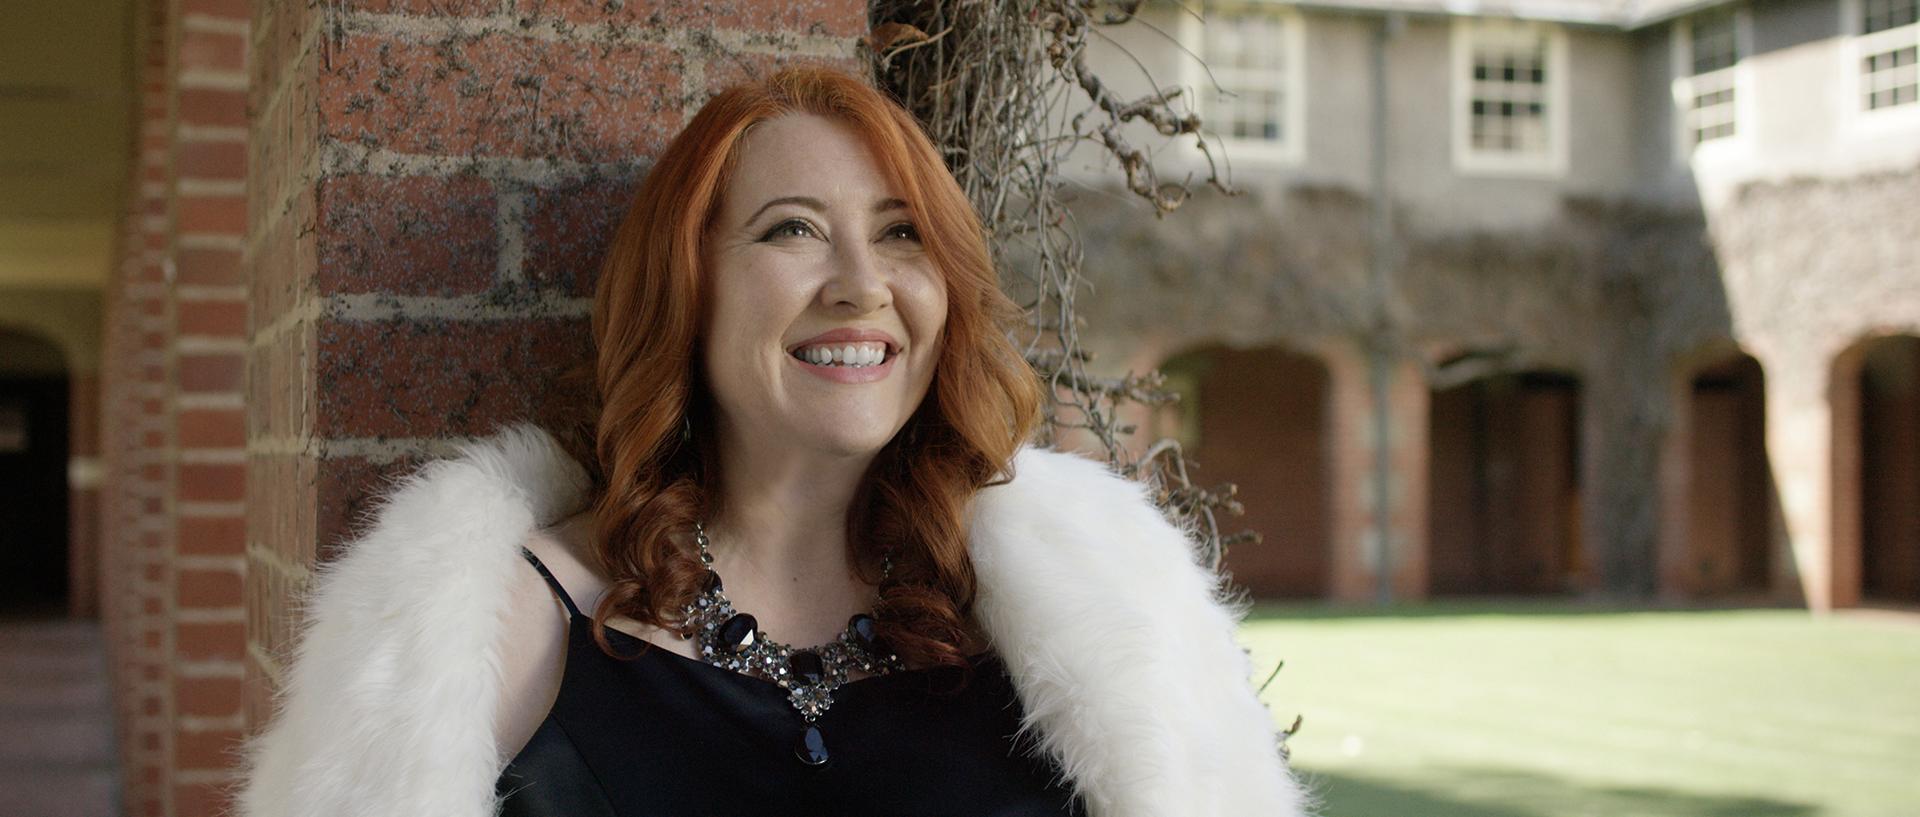 Sally in Shakespeare Republic, Season 2